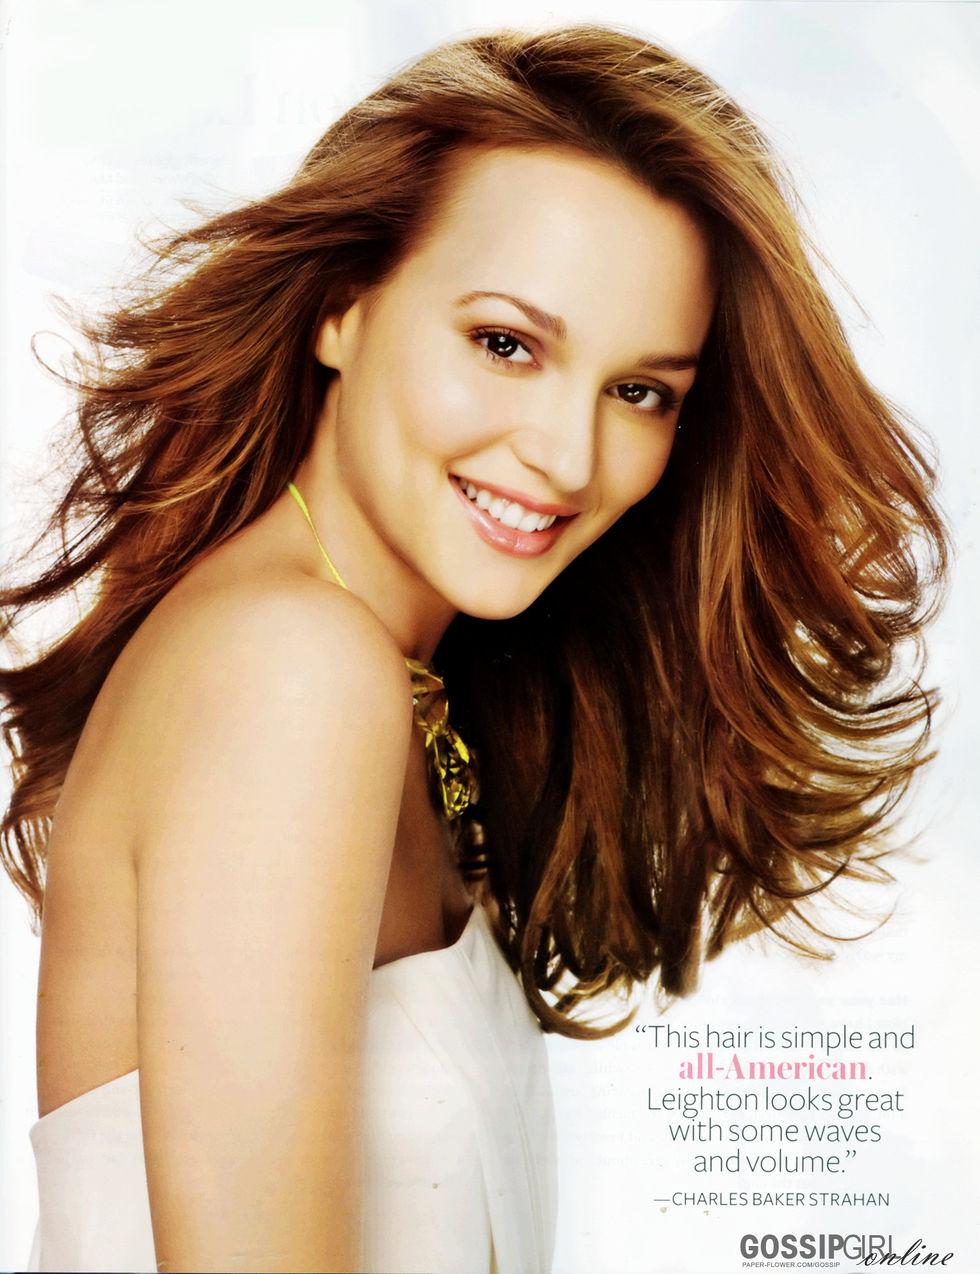 leighton-meester-instyle-hair-magazine-spring-2009-01